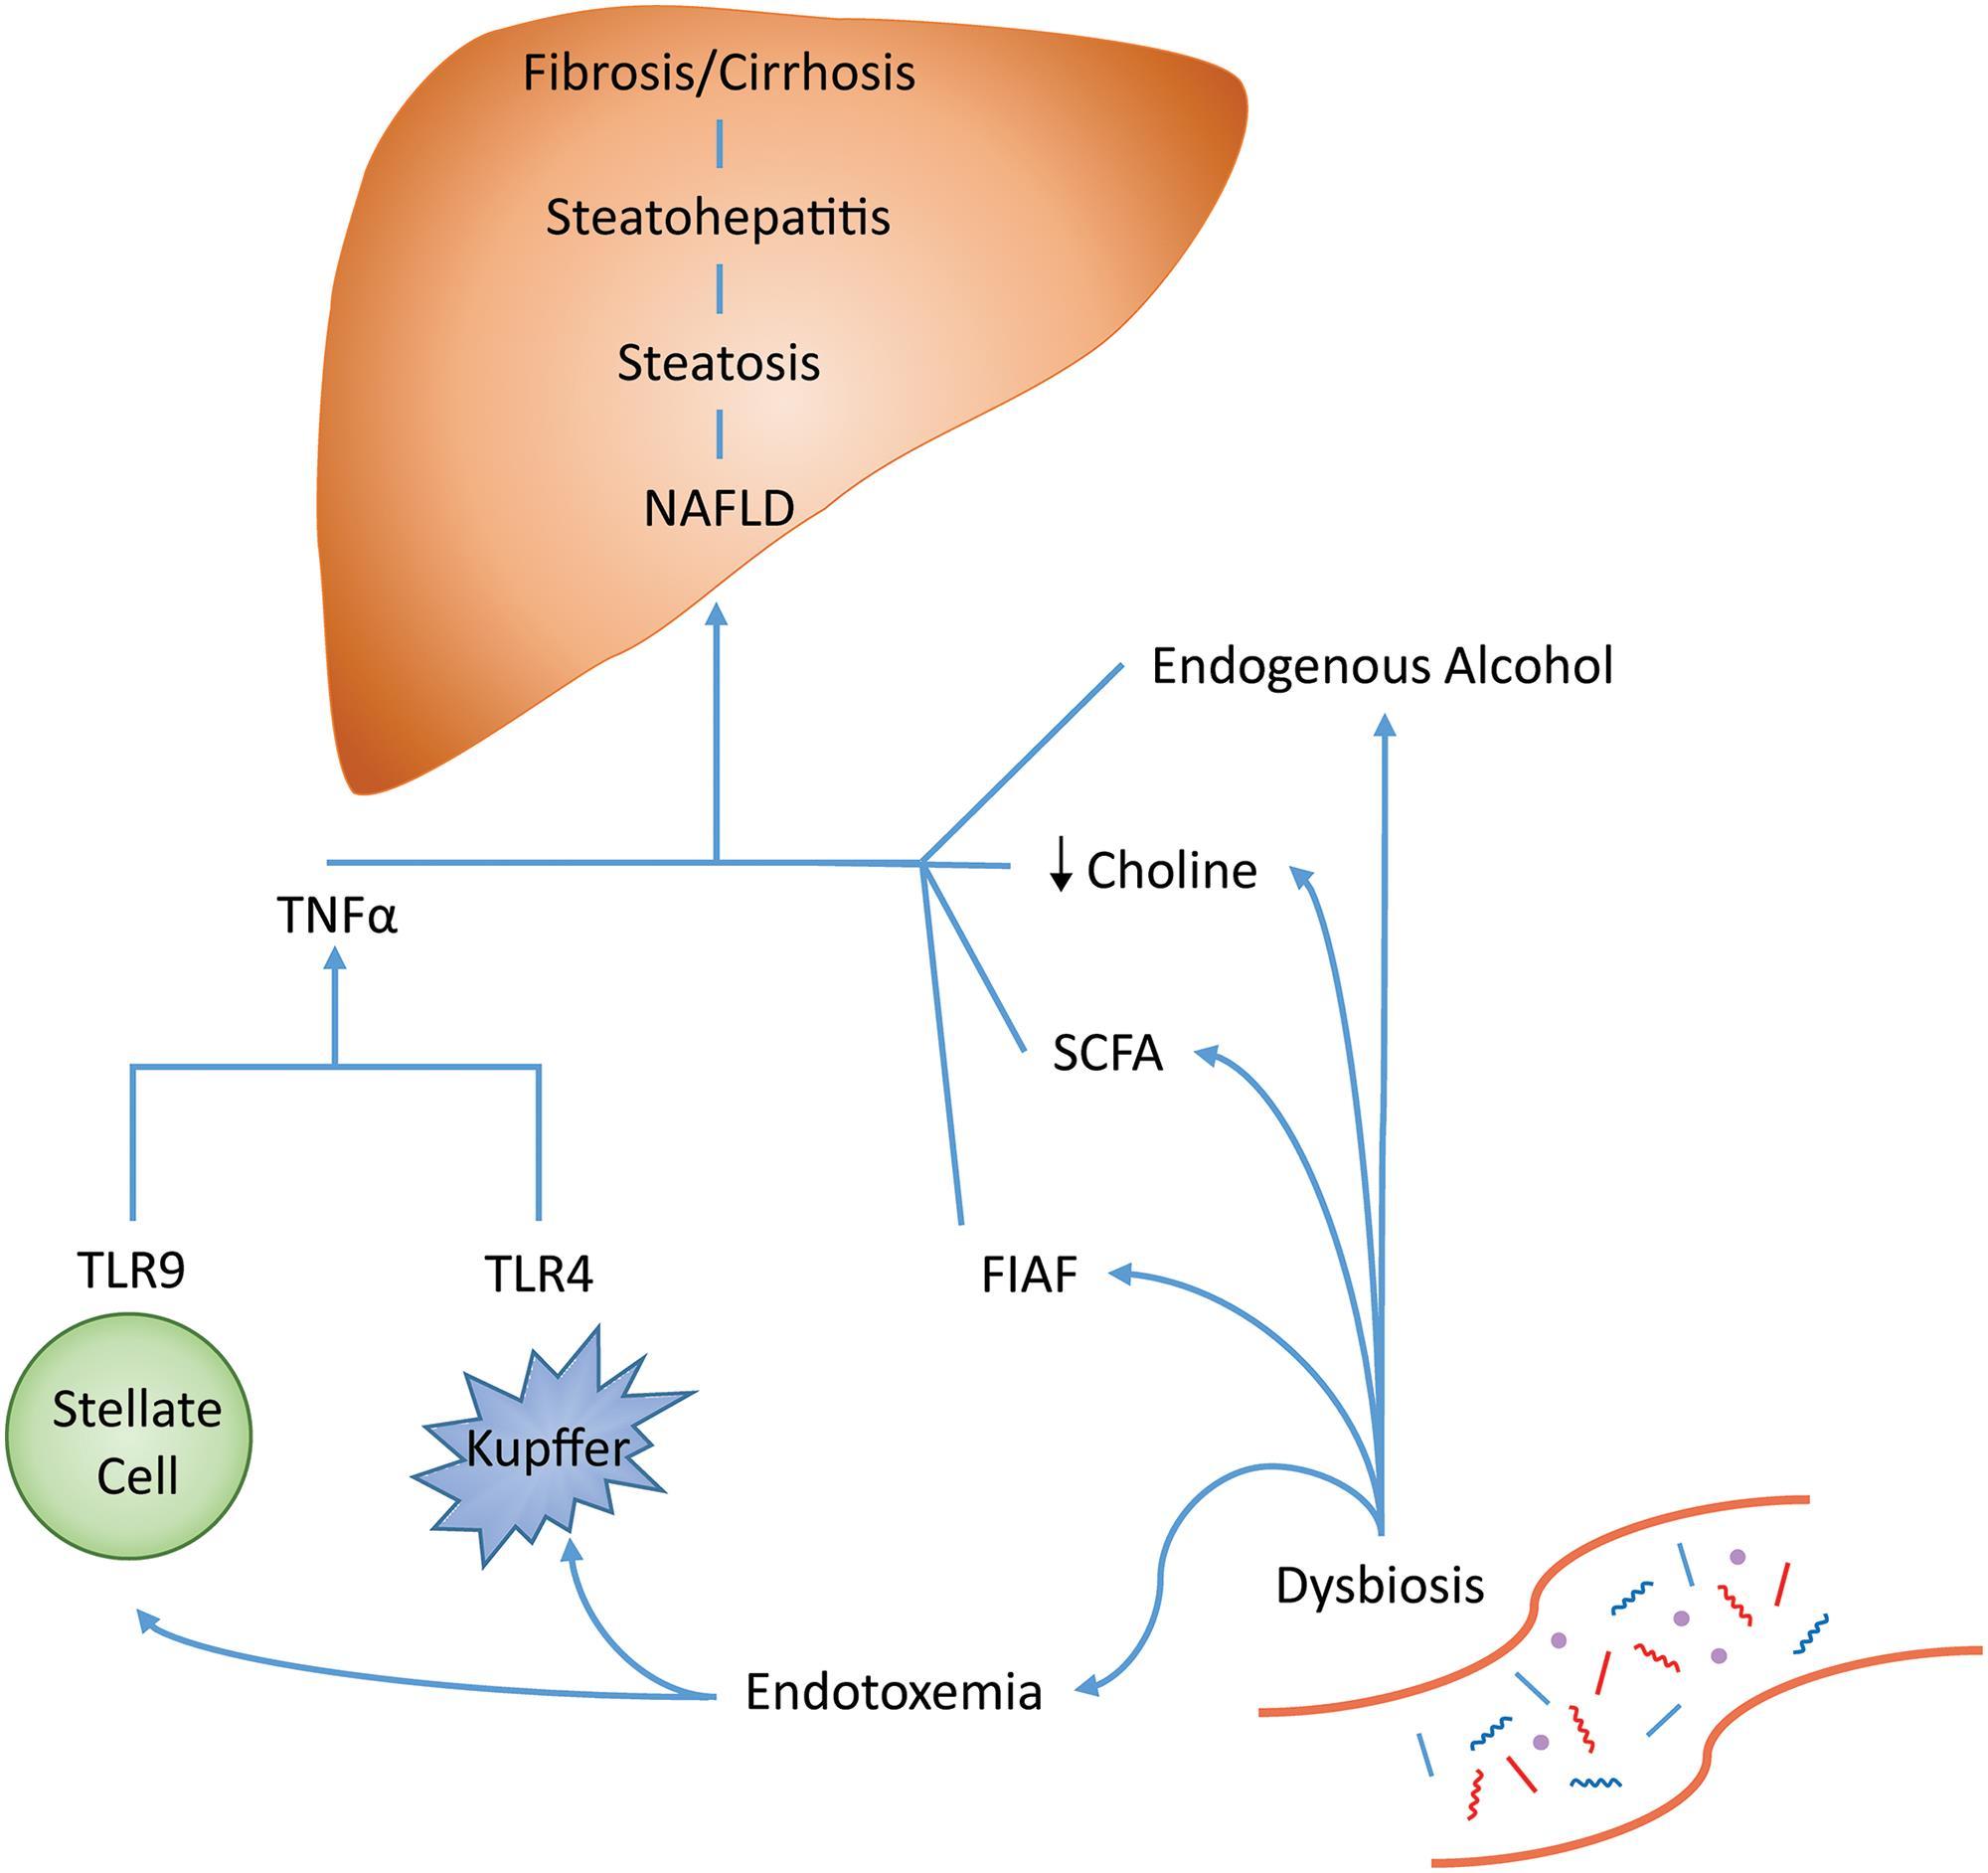 Mechanisms of dysbiosis and NAFLD development.